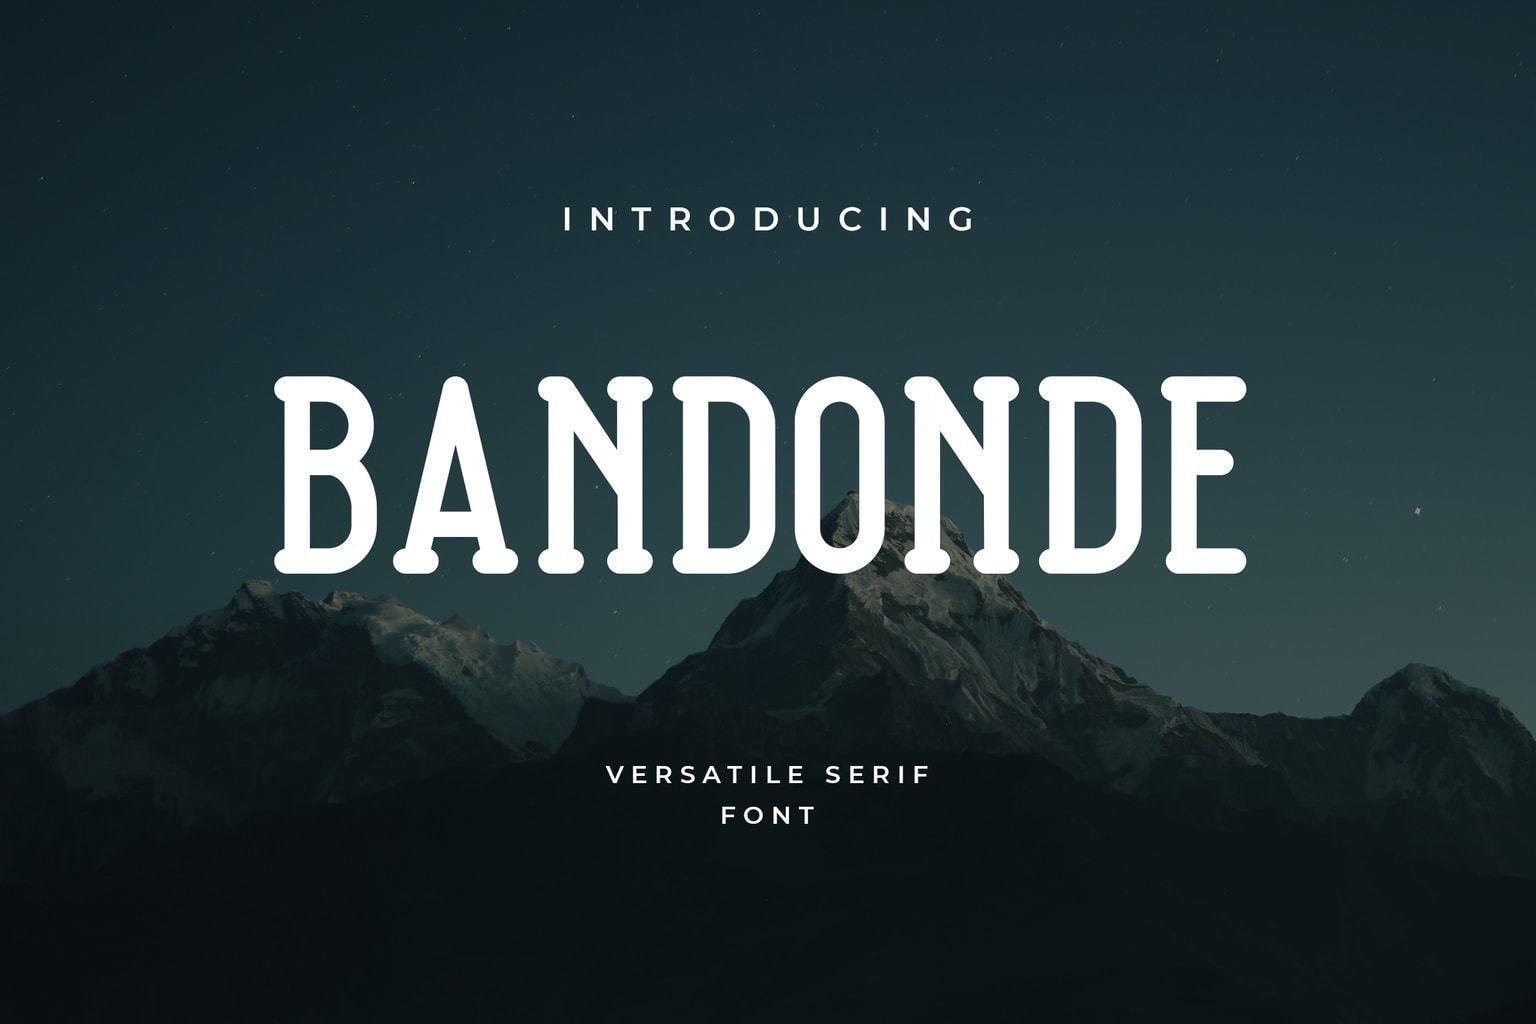 Bandonde-Versatile-Serif-Font-1